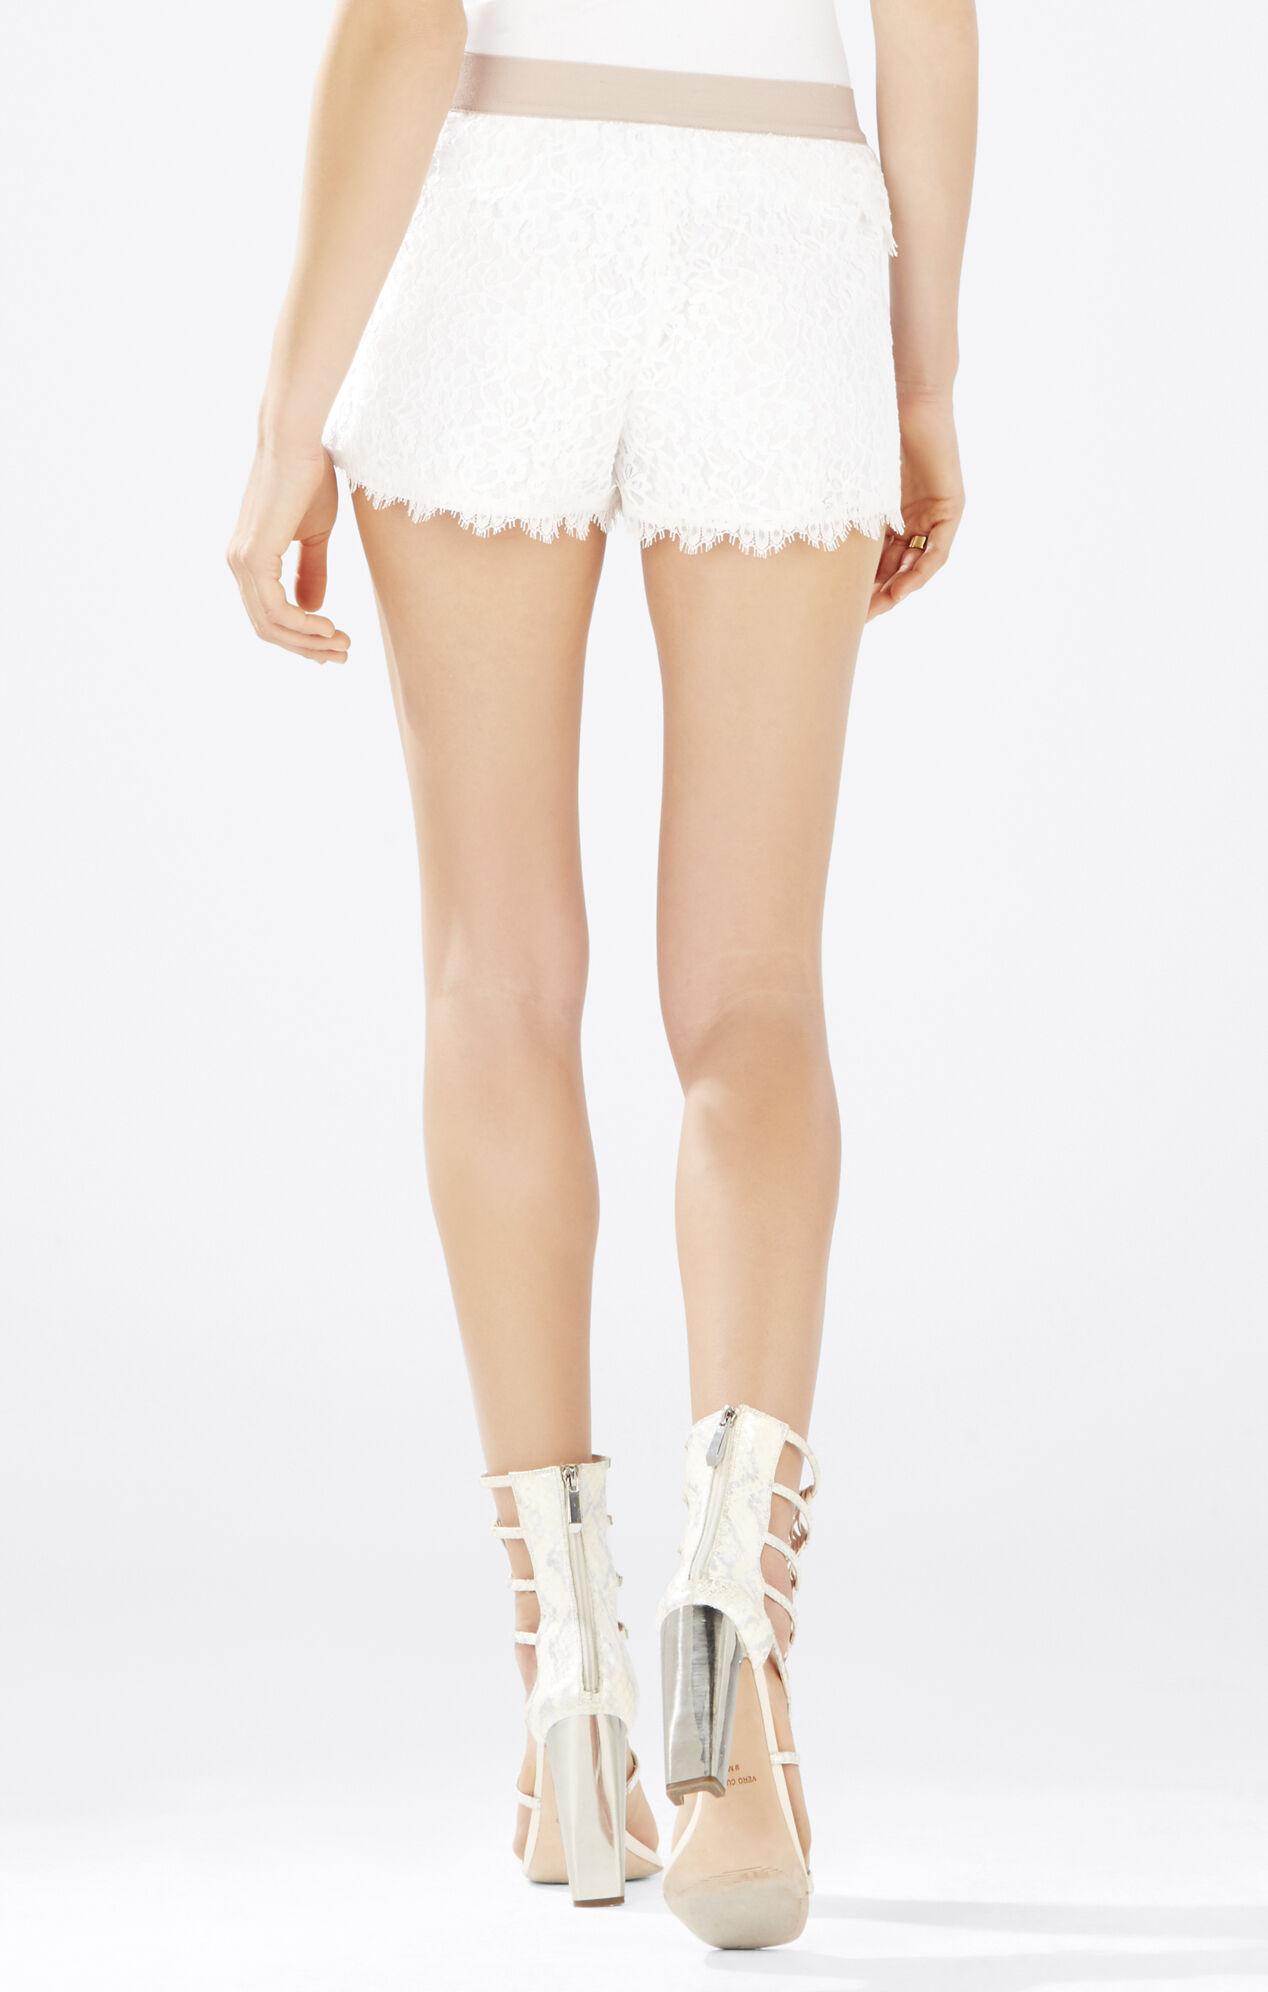 Skirts | Crochet Tiered Lace Short Skirt Pants Shorts ... |Black Tiered Lace Shorts